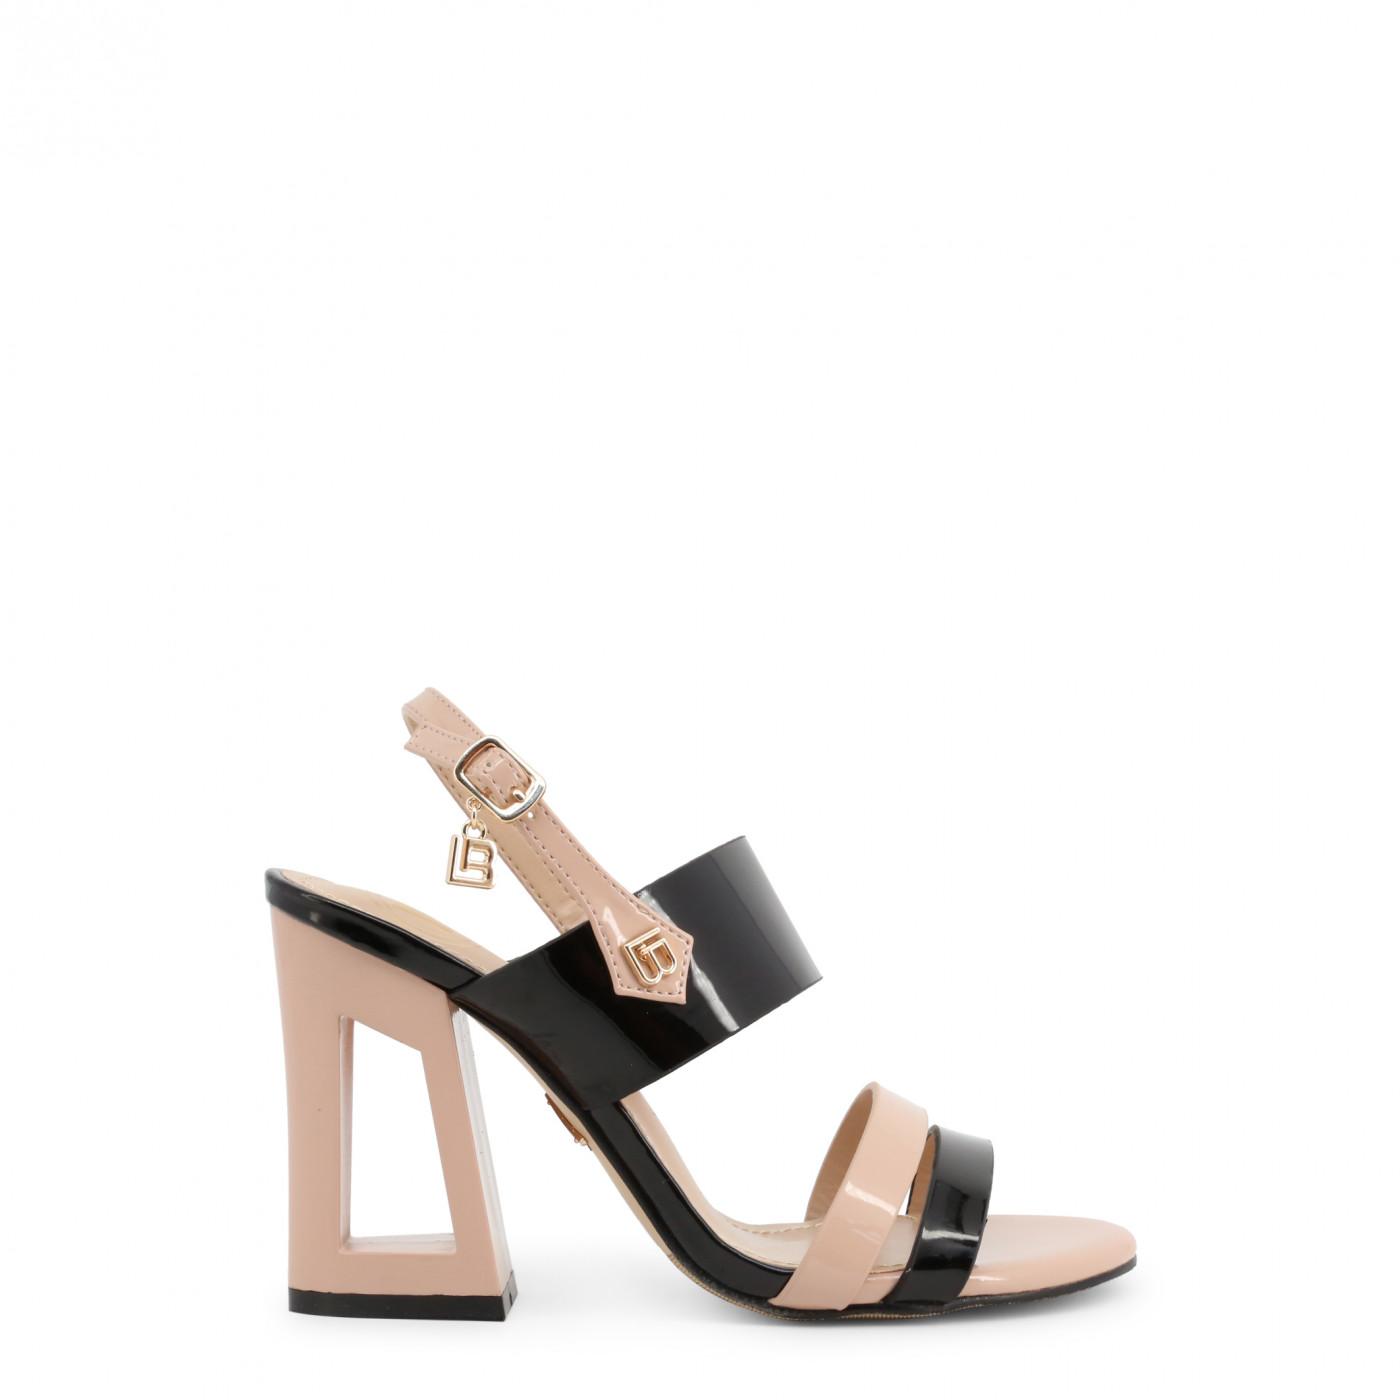 Women's sandals  Laura Biagiotti Straps